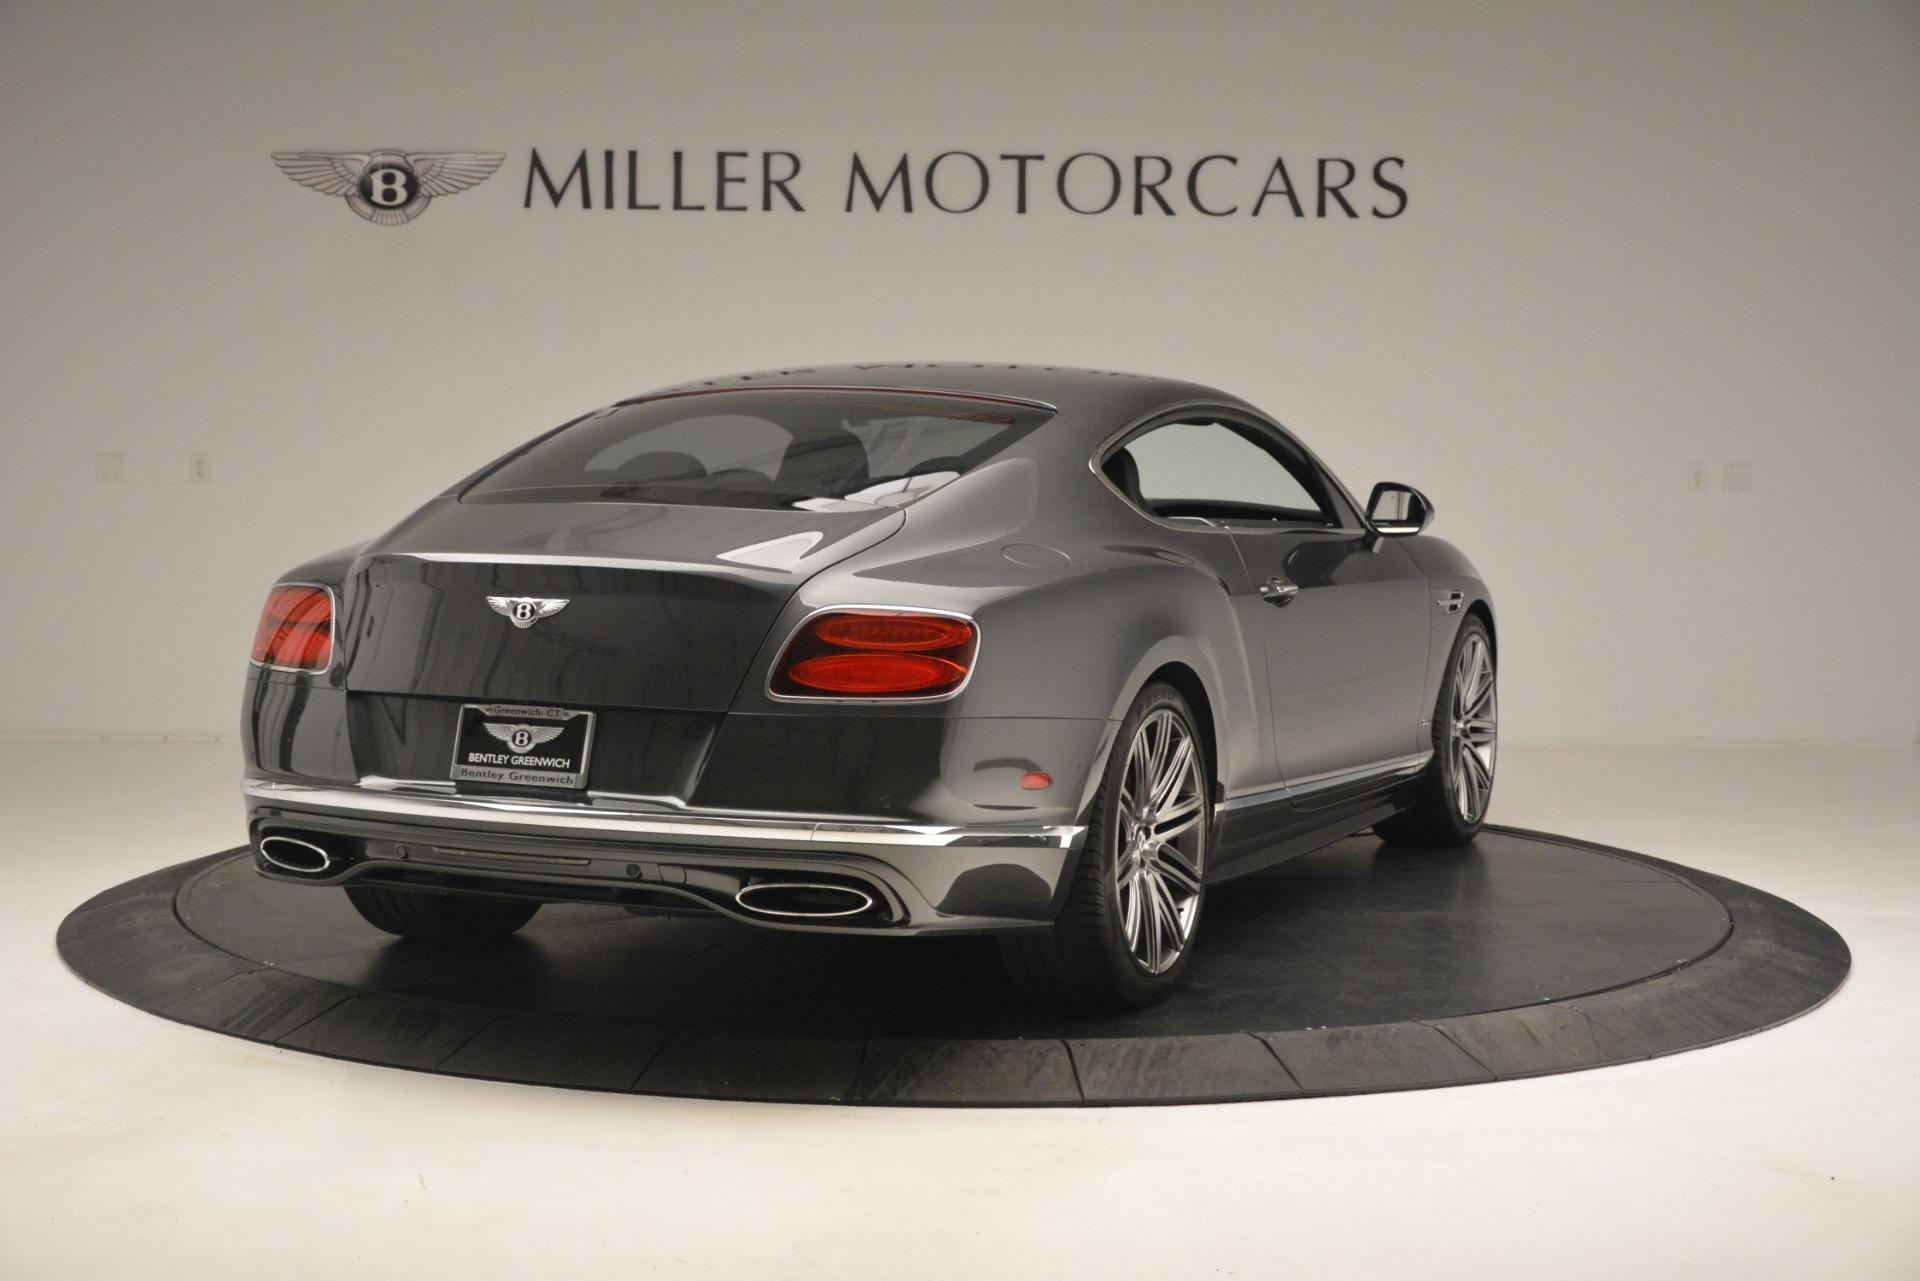 Used 2016 Bentley Continental GT Speed For Sale In Westport, CT 2953_p7